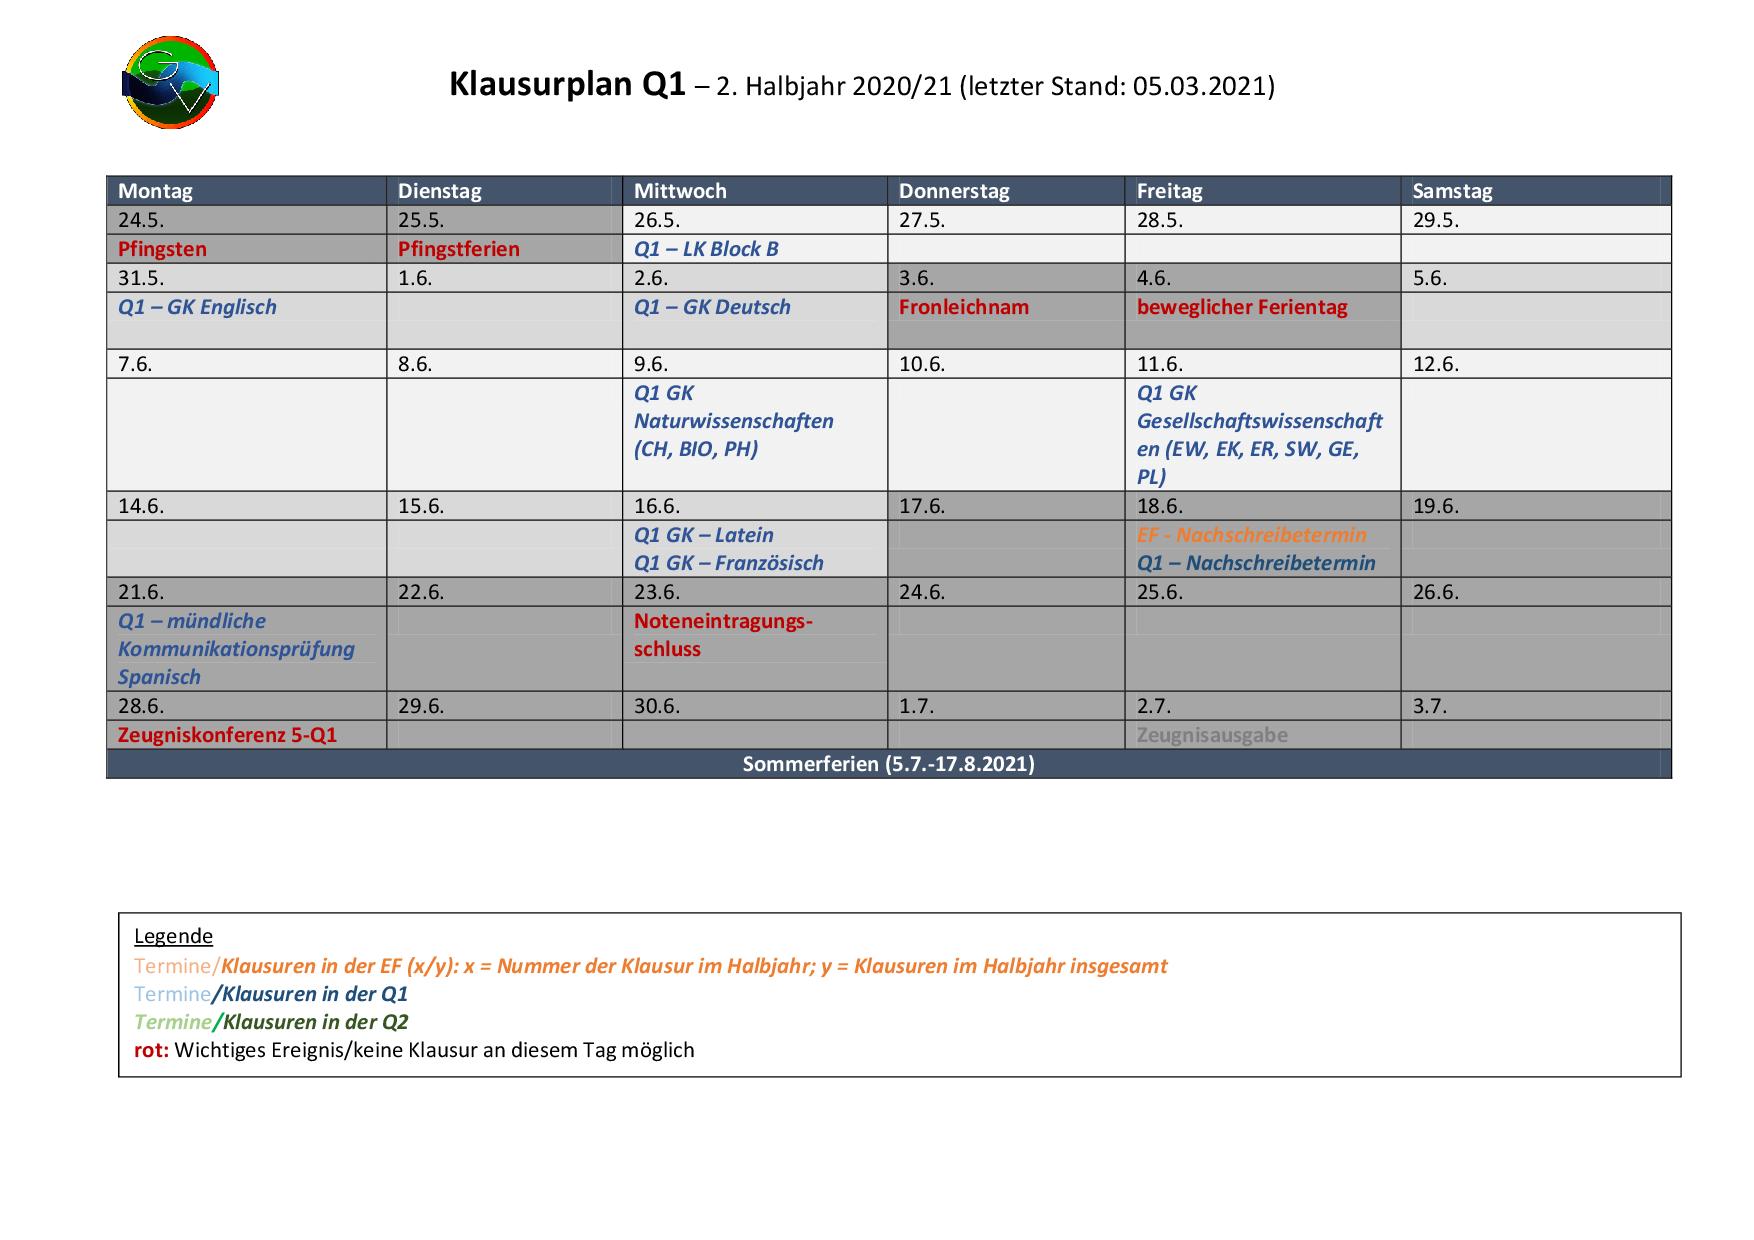 2021-03-05_Klausurplan-Q1-2HJ-4-003